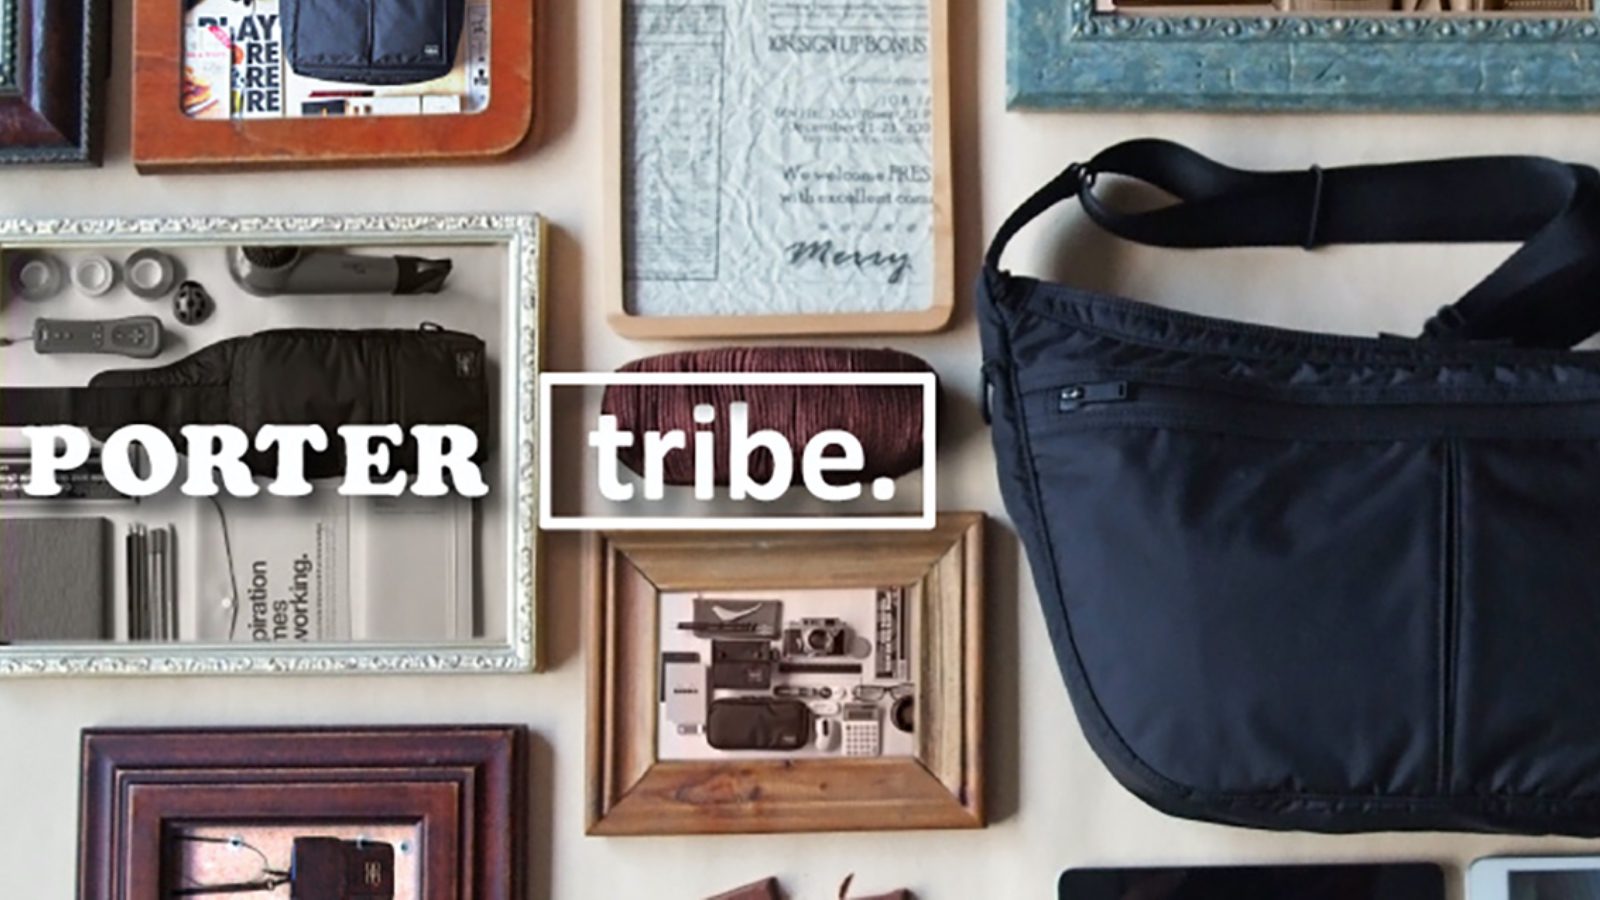 PORTER tribe.